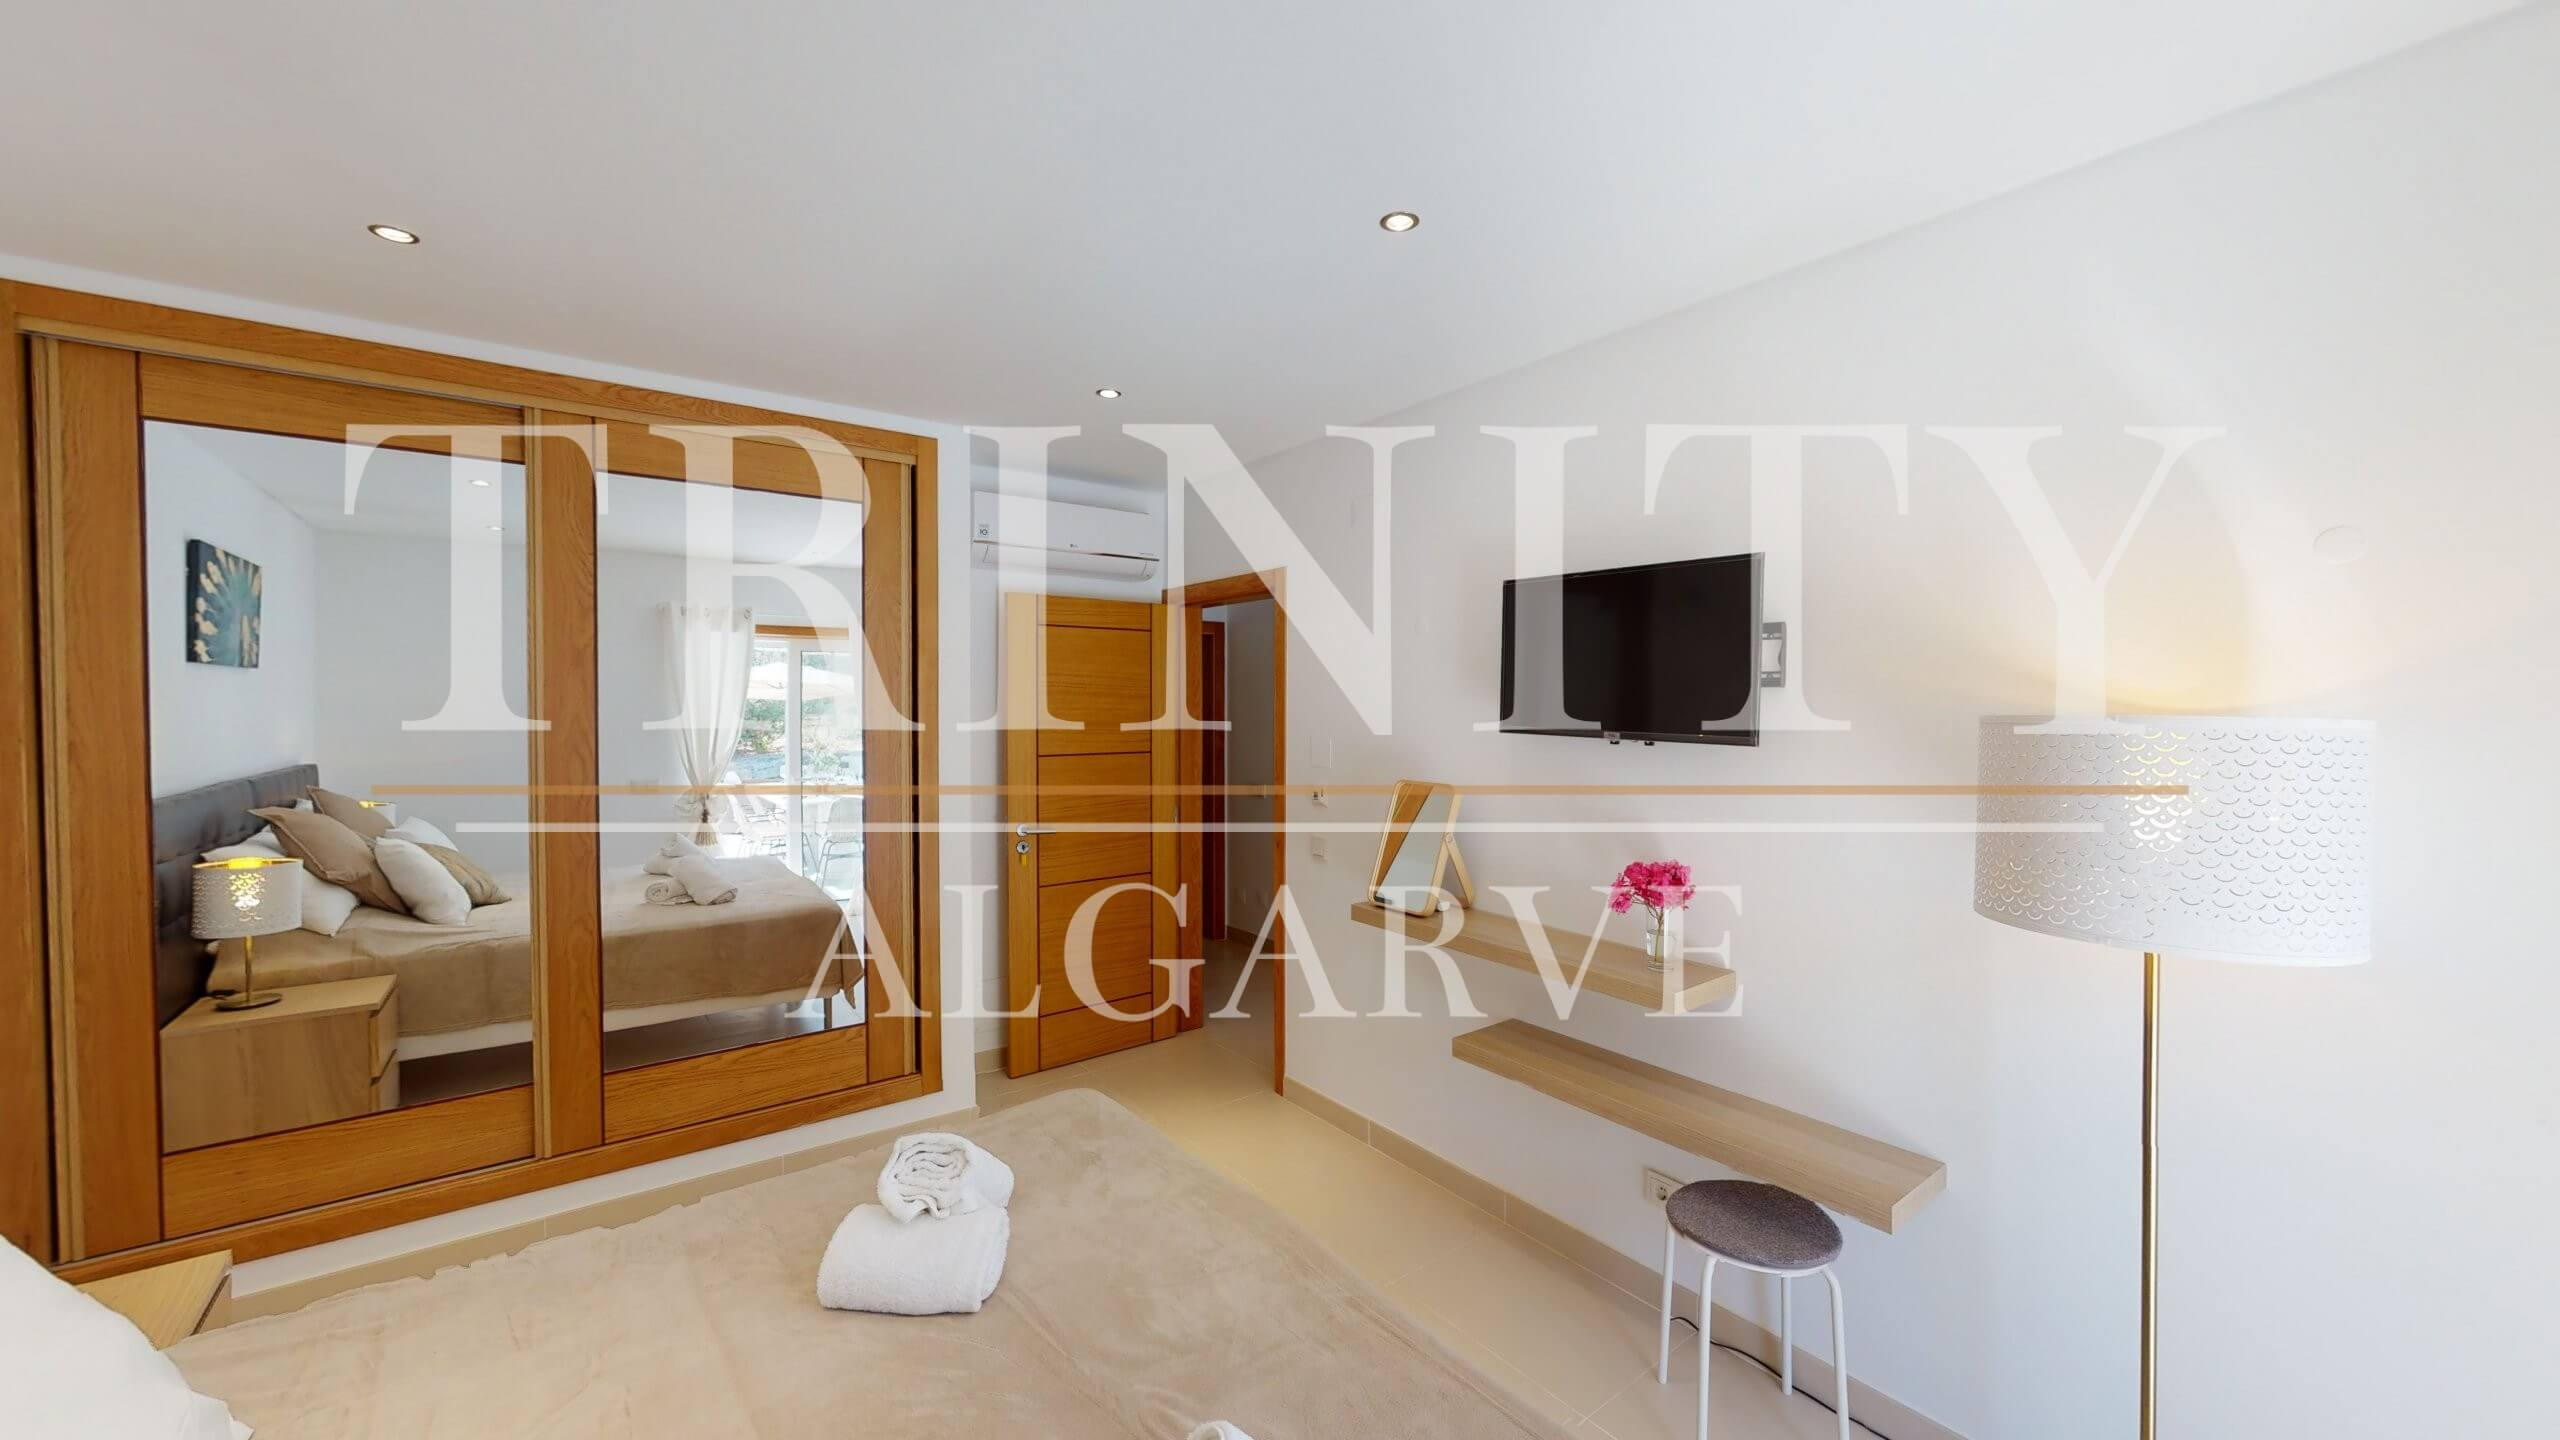 35-The-Crest-by-Trinity-Algarve-07032020_113901